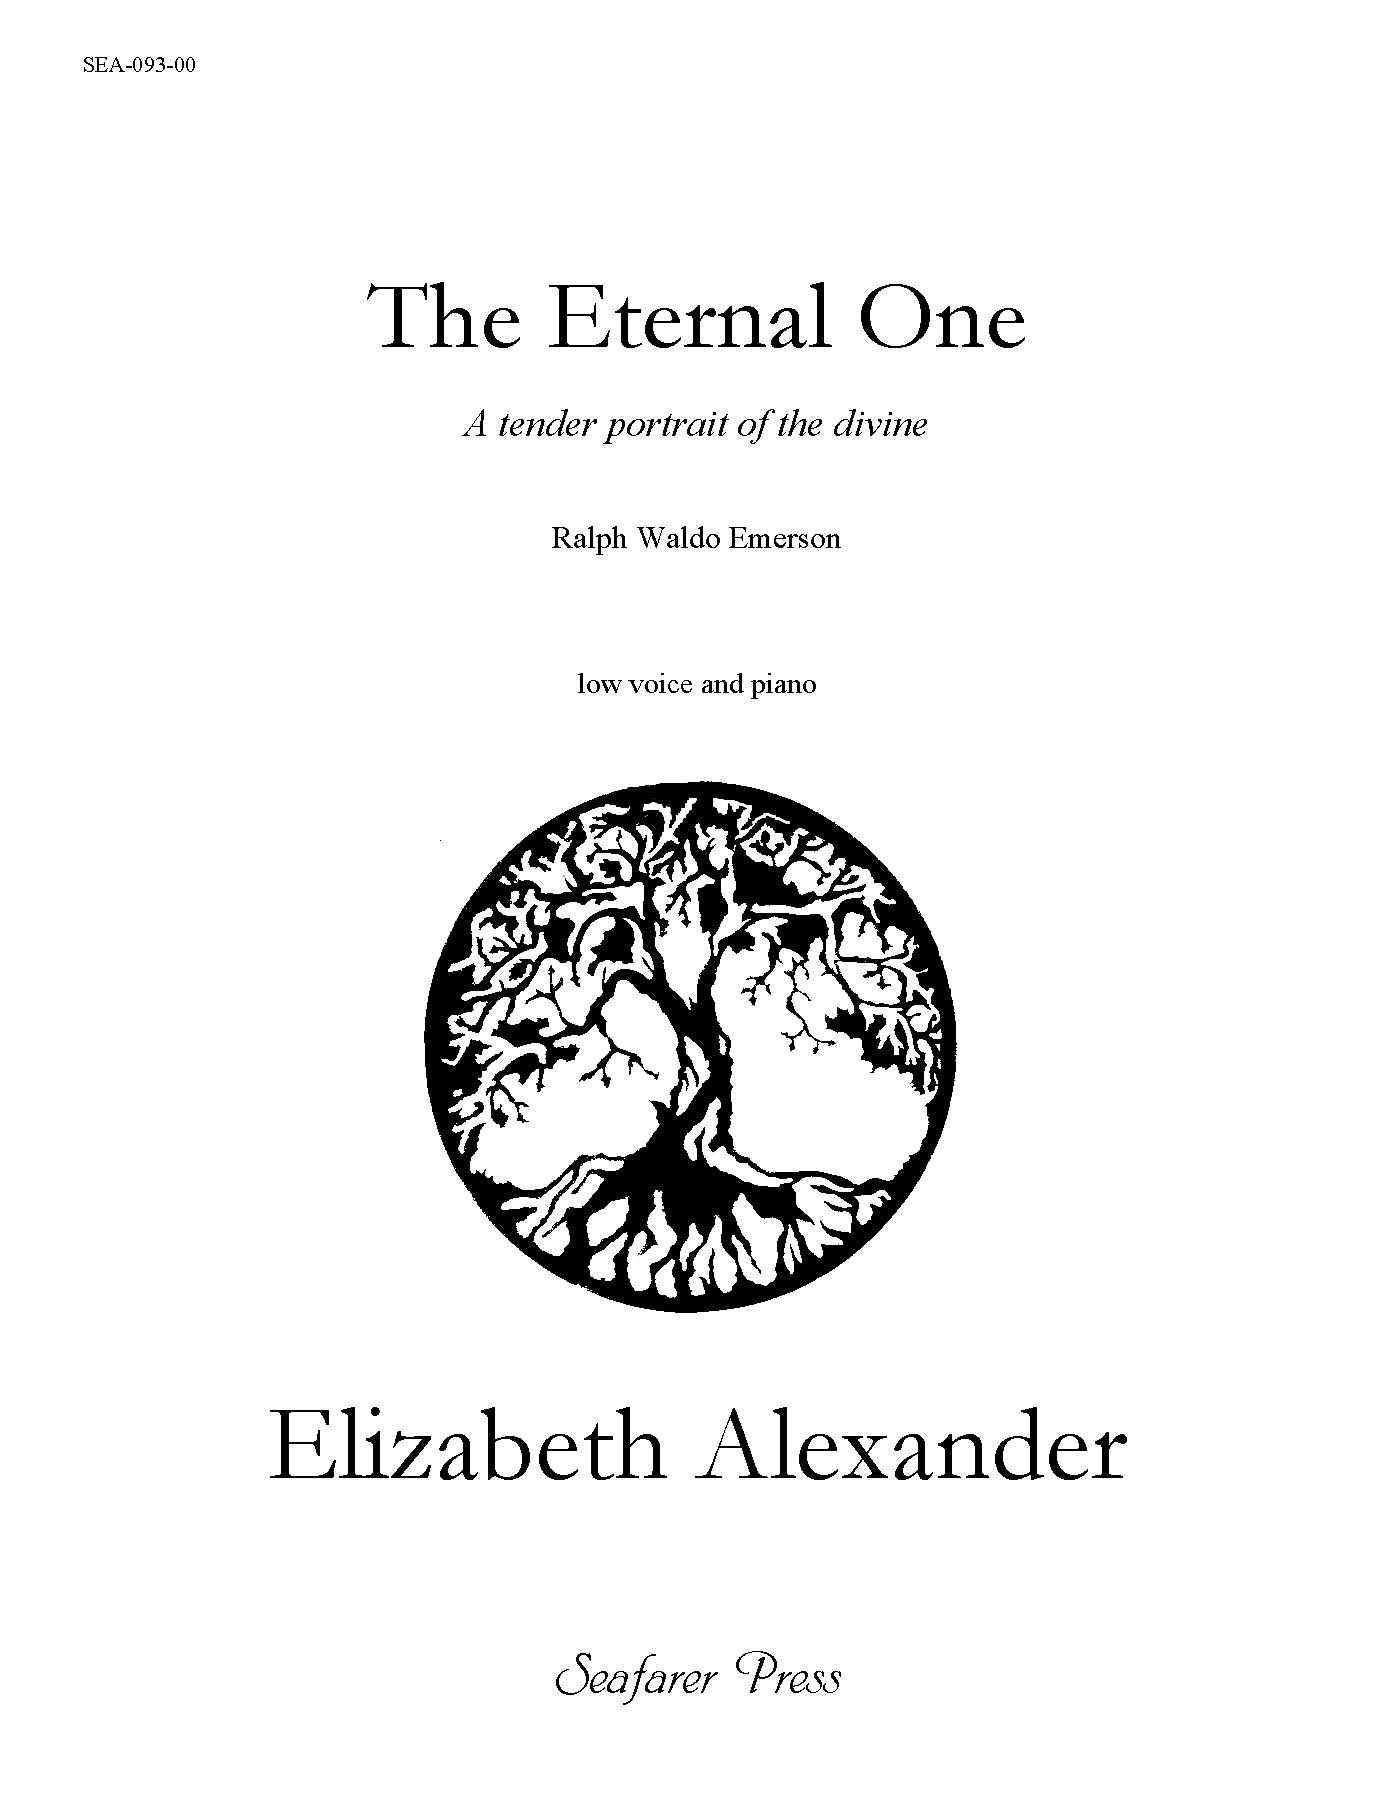 SEA-093-00 - The Eternal One